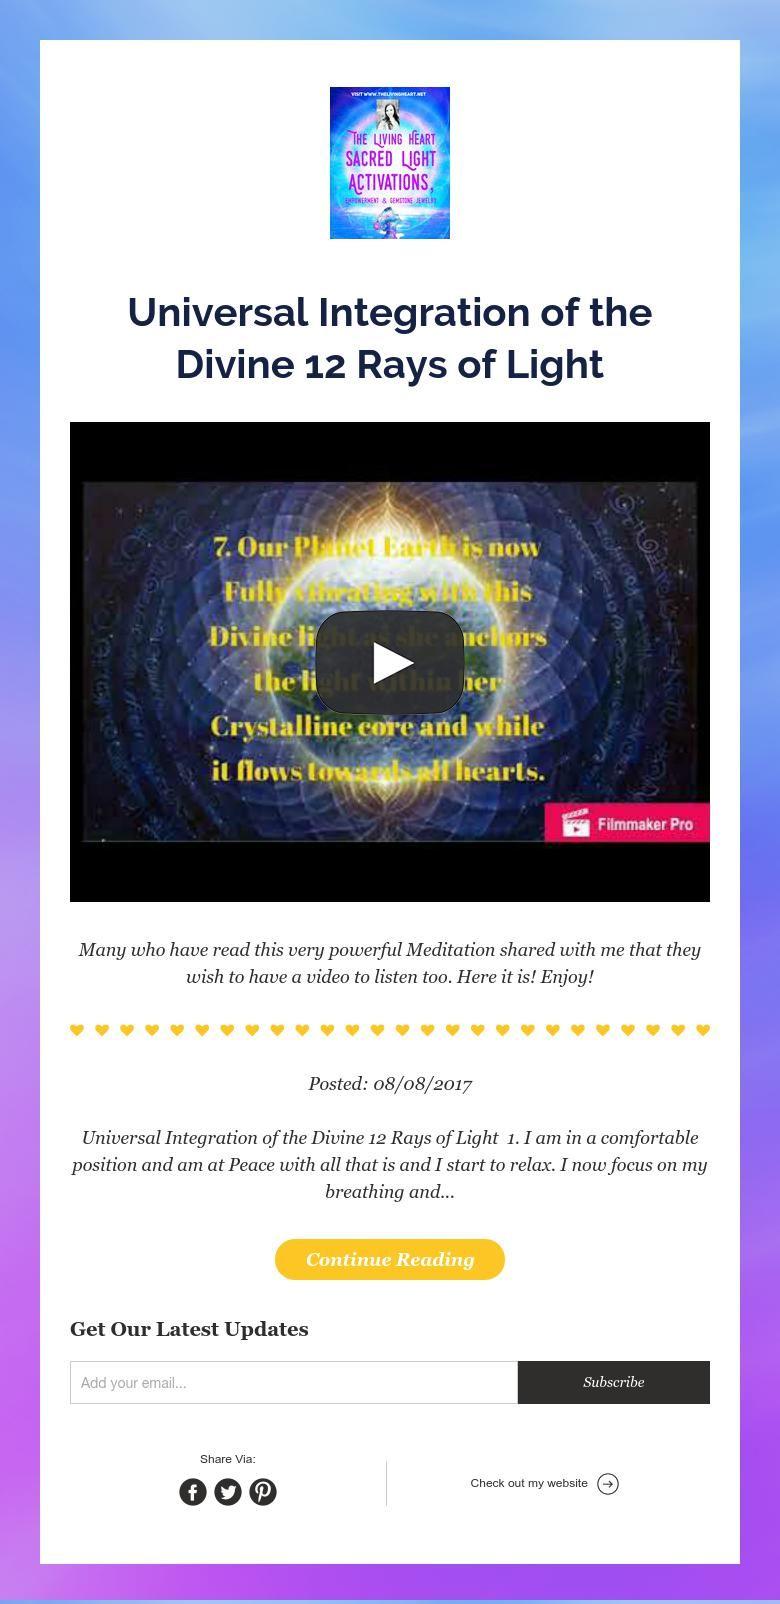 Universal Integration Of The Divine 12 Rays Of Light Power Of Meditation Meditation Reading